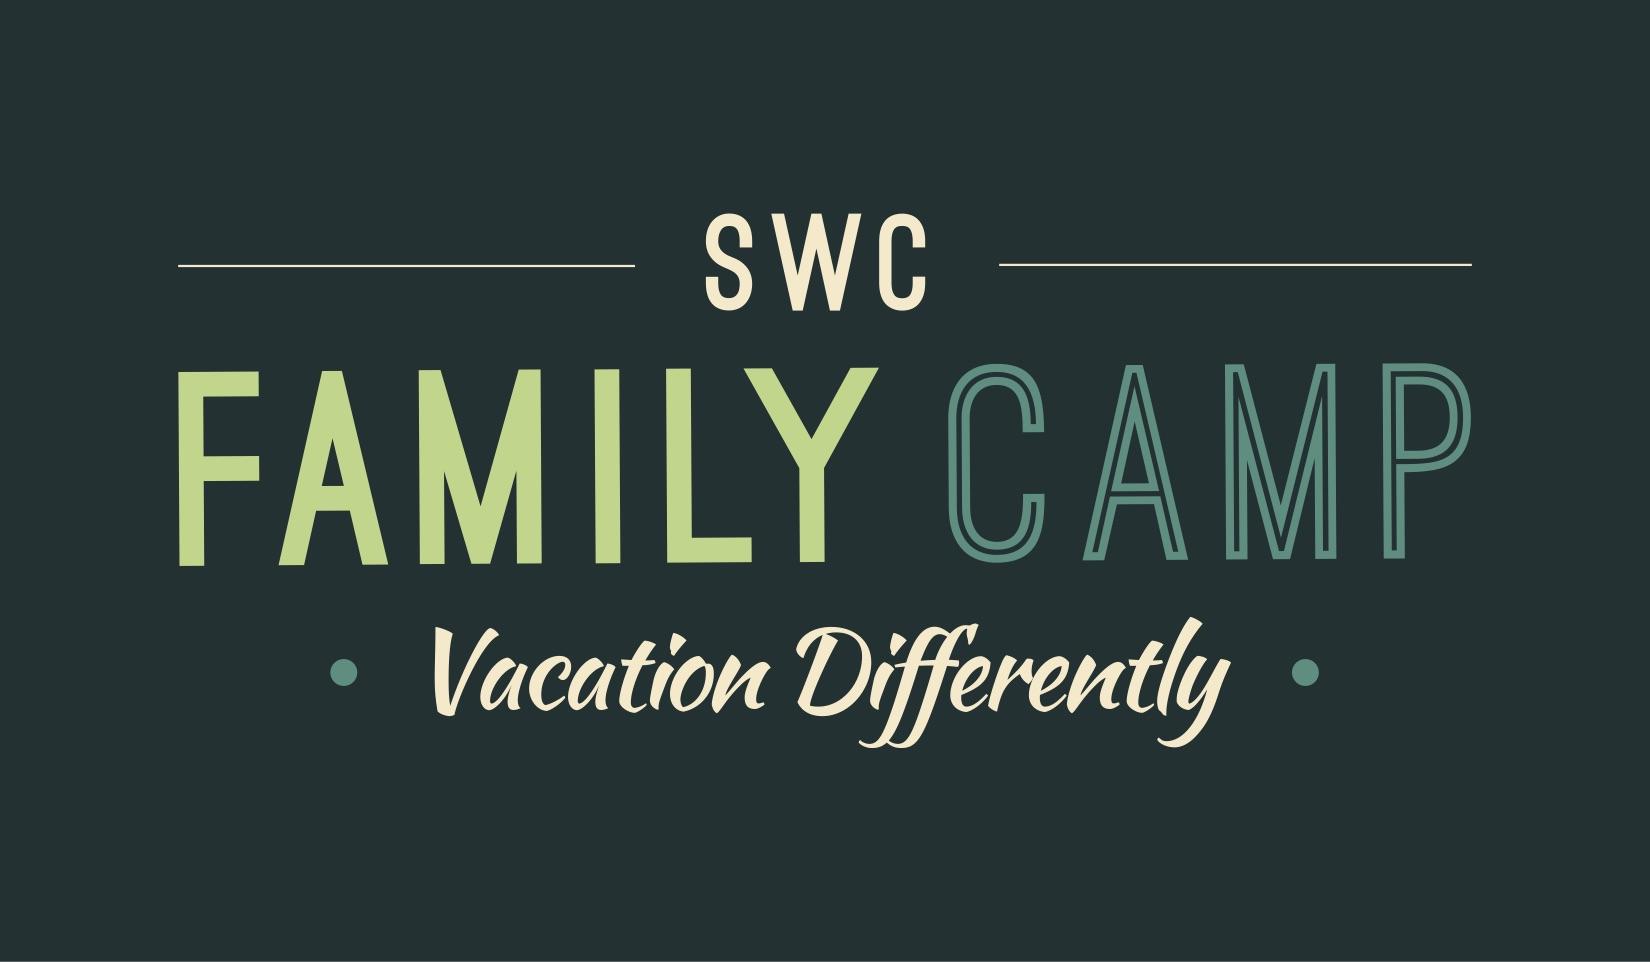 Swcfamilycamp logo 01  2